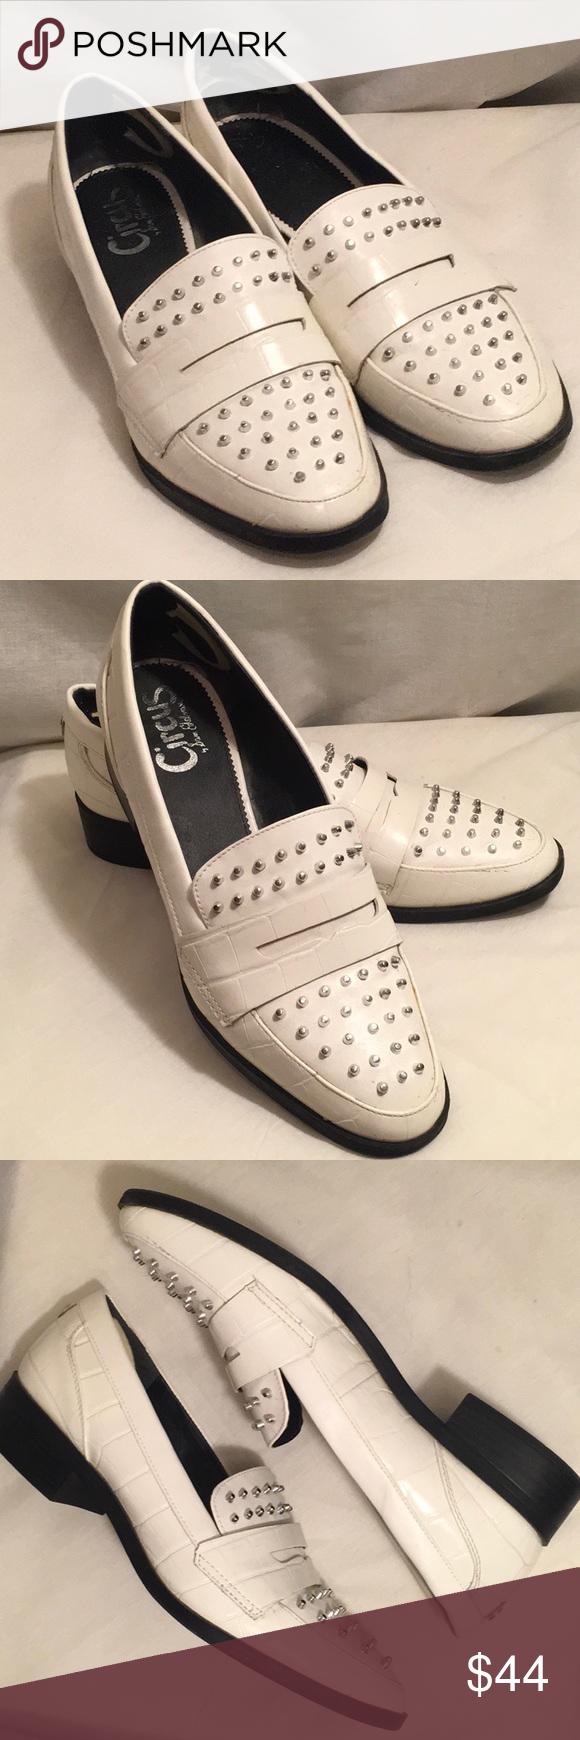 a503ce706c9bb7 10 LALI SAM EDELMAN CIRCUS White Studded Loafers Size 10 Women s White  Studded SAM EDELMAN CIRCUS